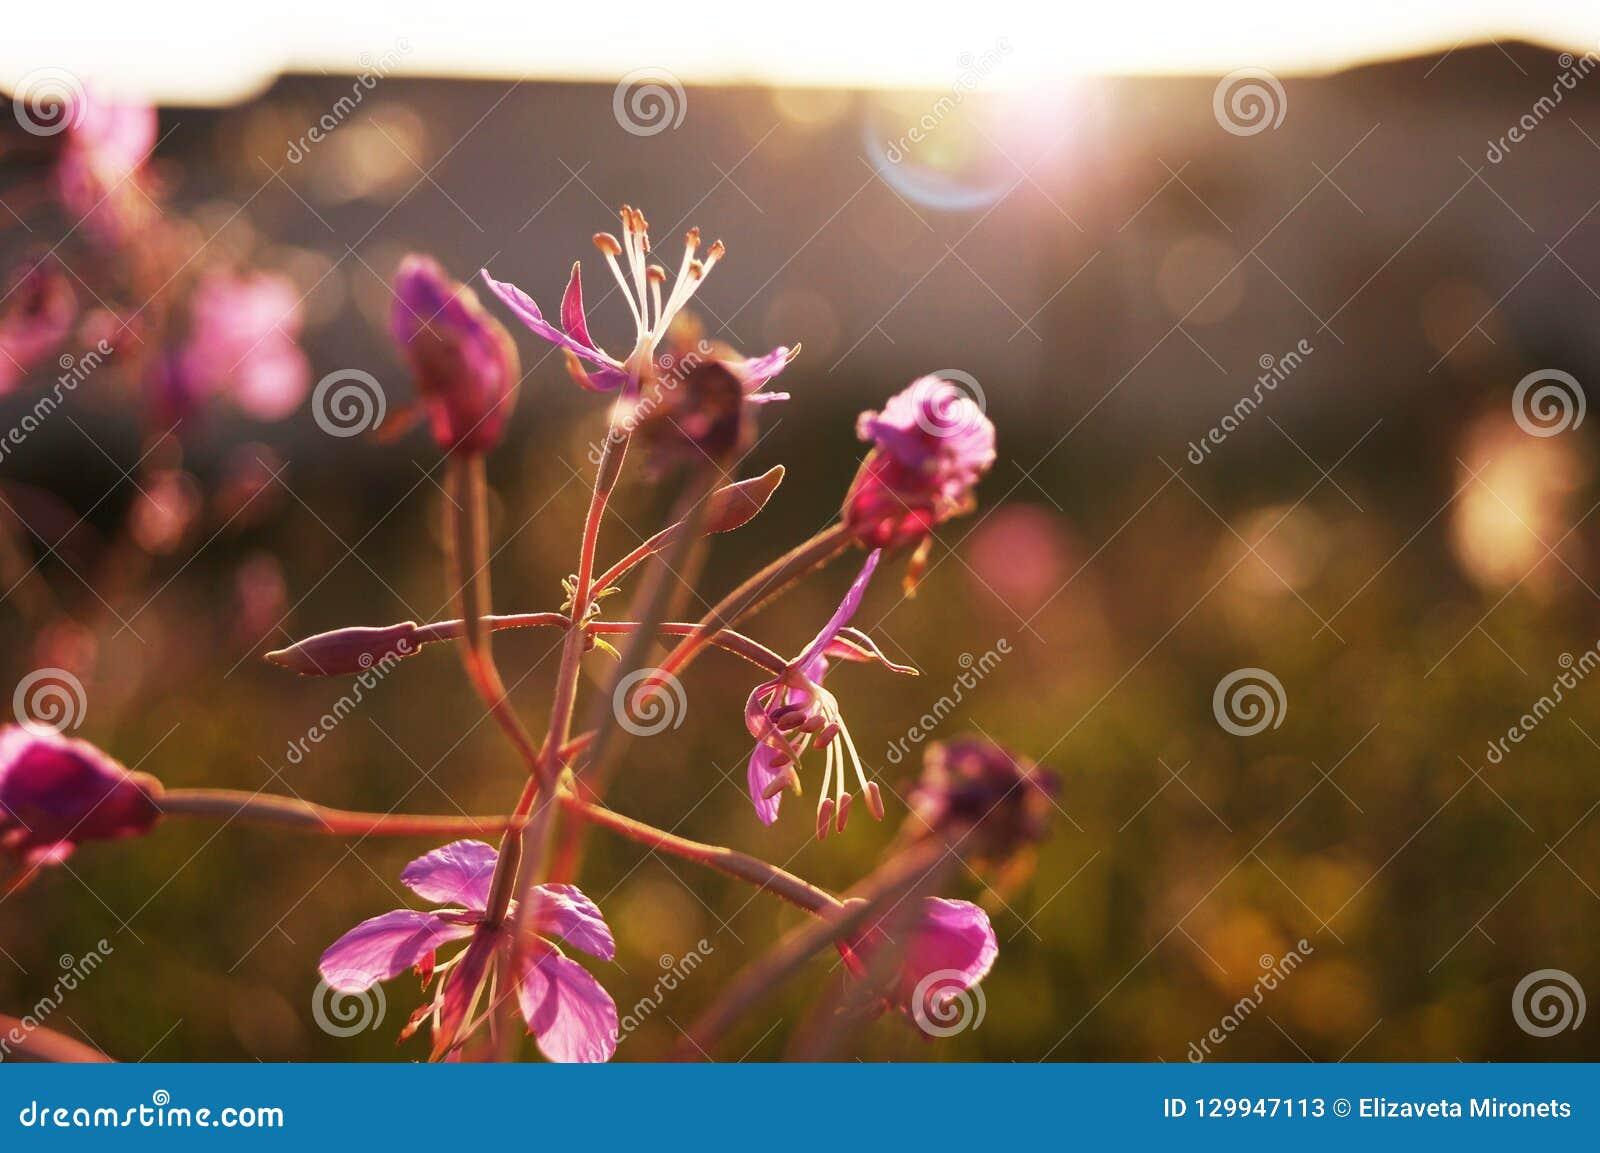 Kwitnie herbaty na tle pole